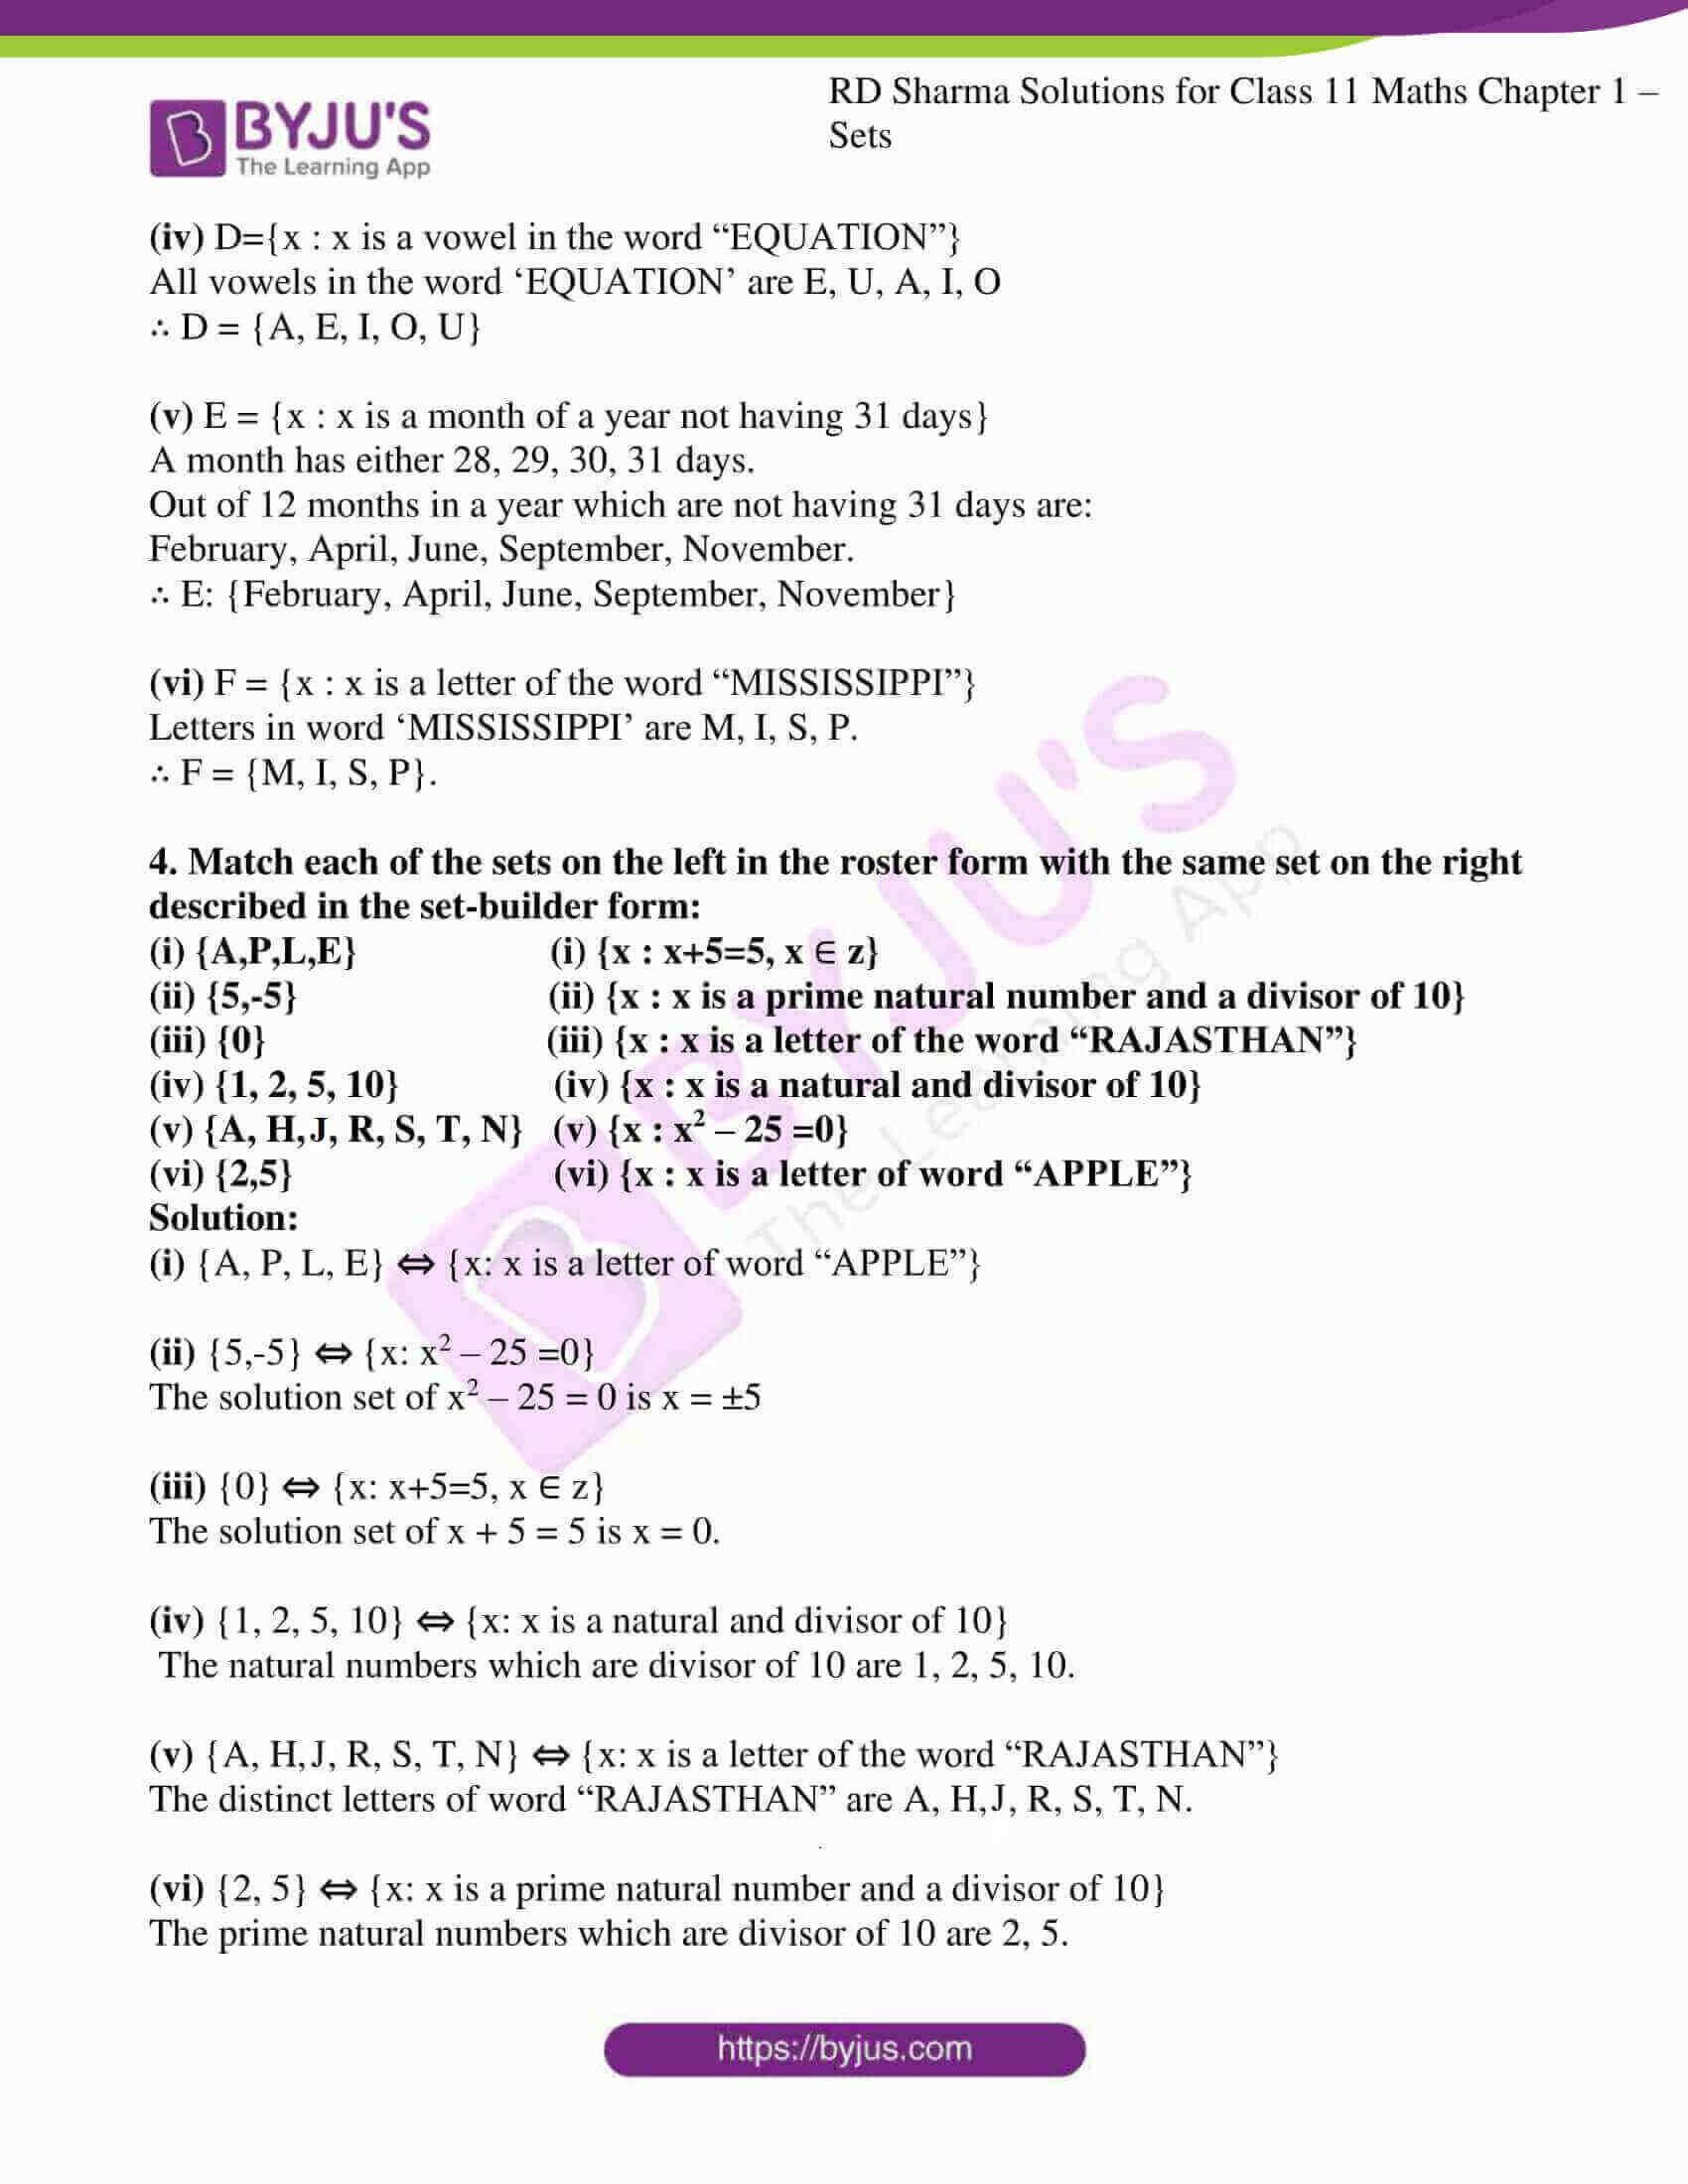 rd sharma class 11 maths ch 1 sets ex 2 5